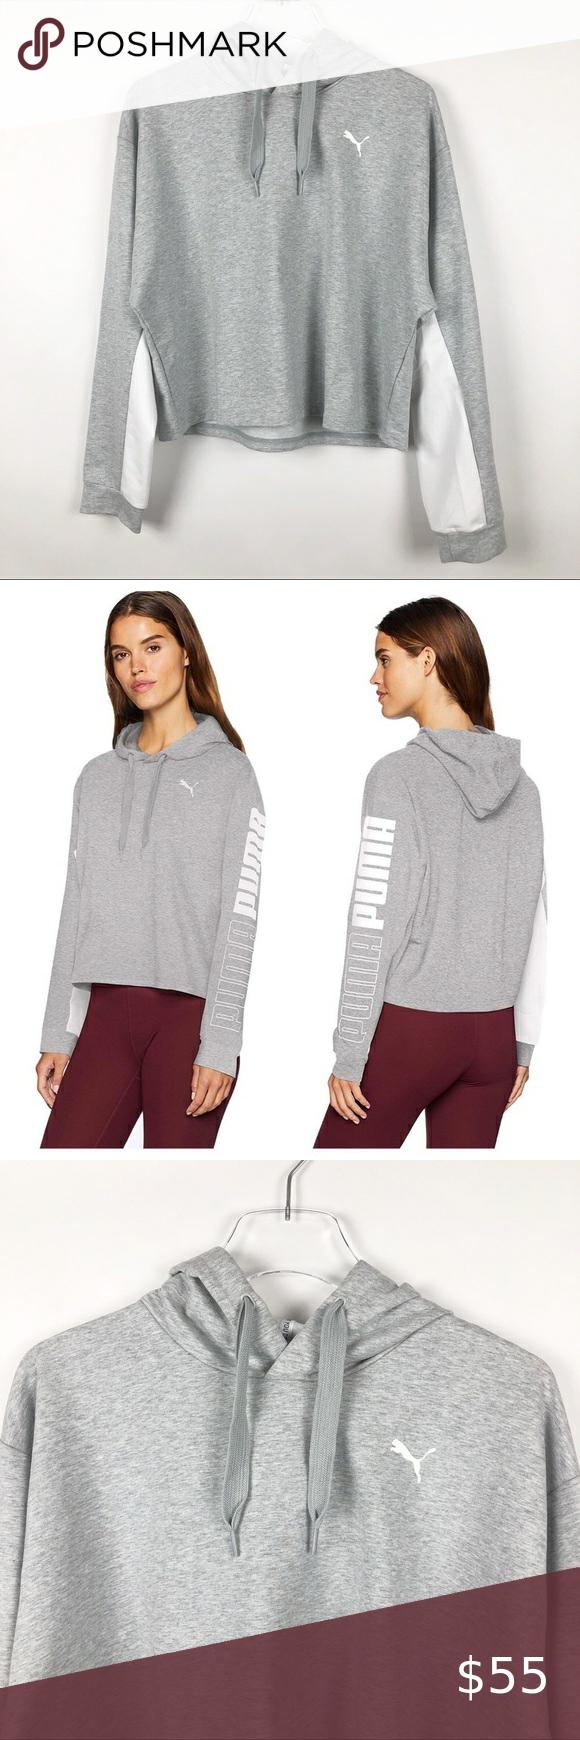 Puma Women S Modern Sport Sweatshirt Hoodie Top L In 2021 Sports Hoodies Puma Women Sports Sweatshirts [ 1740 x 580 Pixel ]